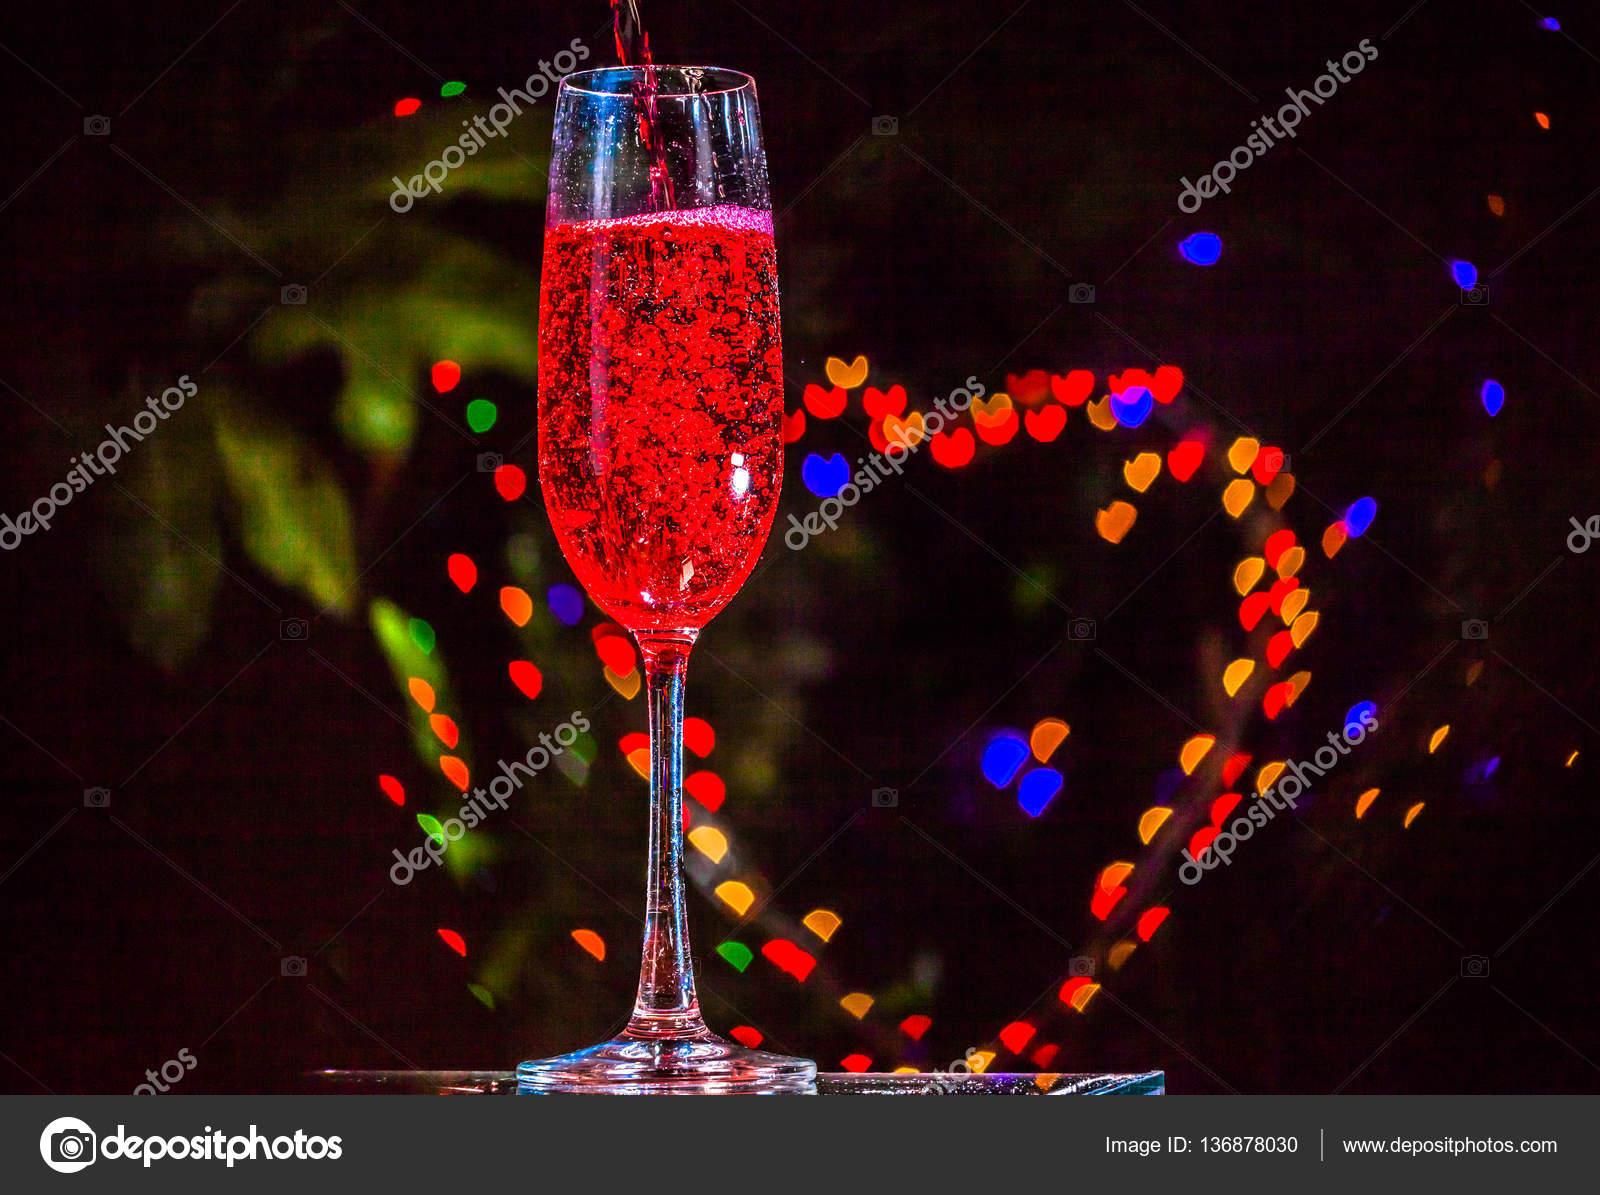 Bubble Herz in Getränk — Stockfoto © thaisign #136878030